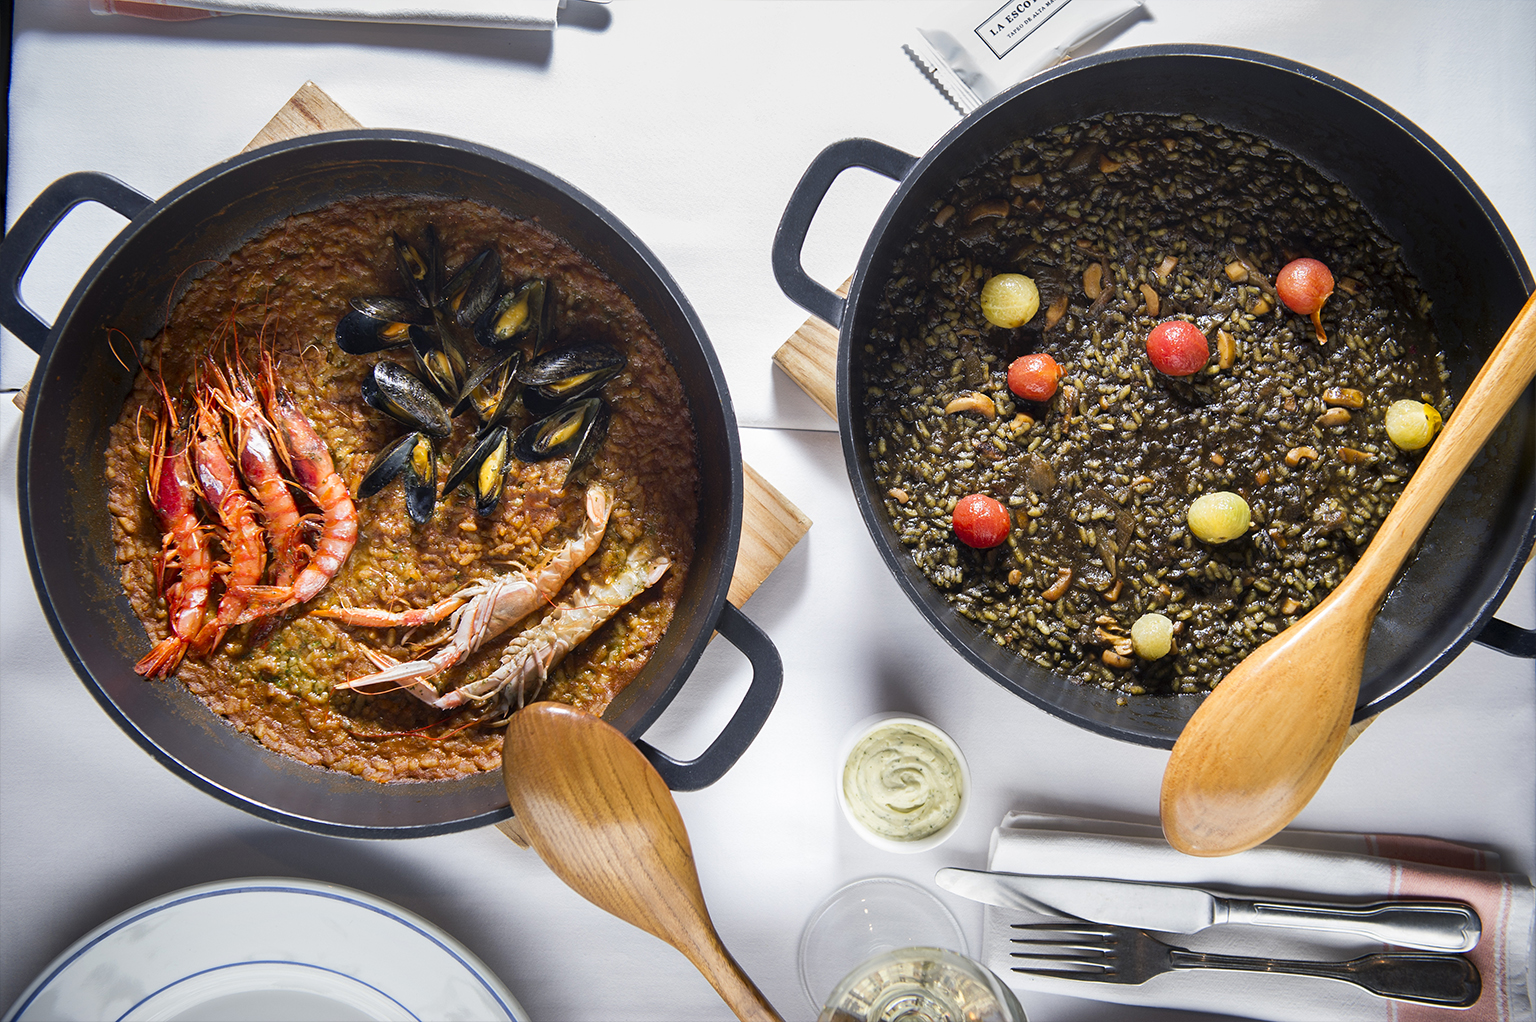 arroz la esCotilla Vitoria-Gasteiz